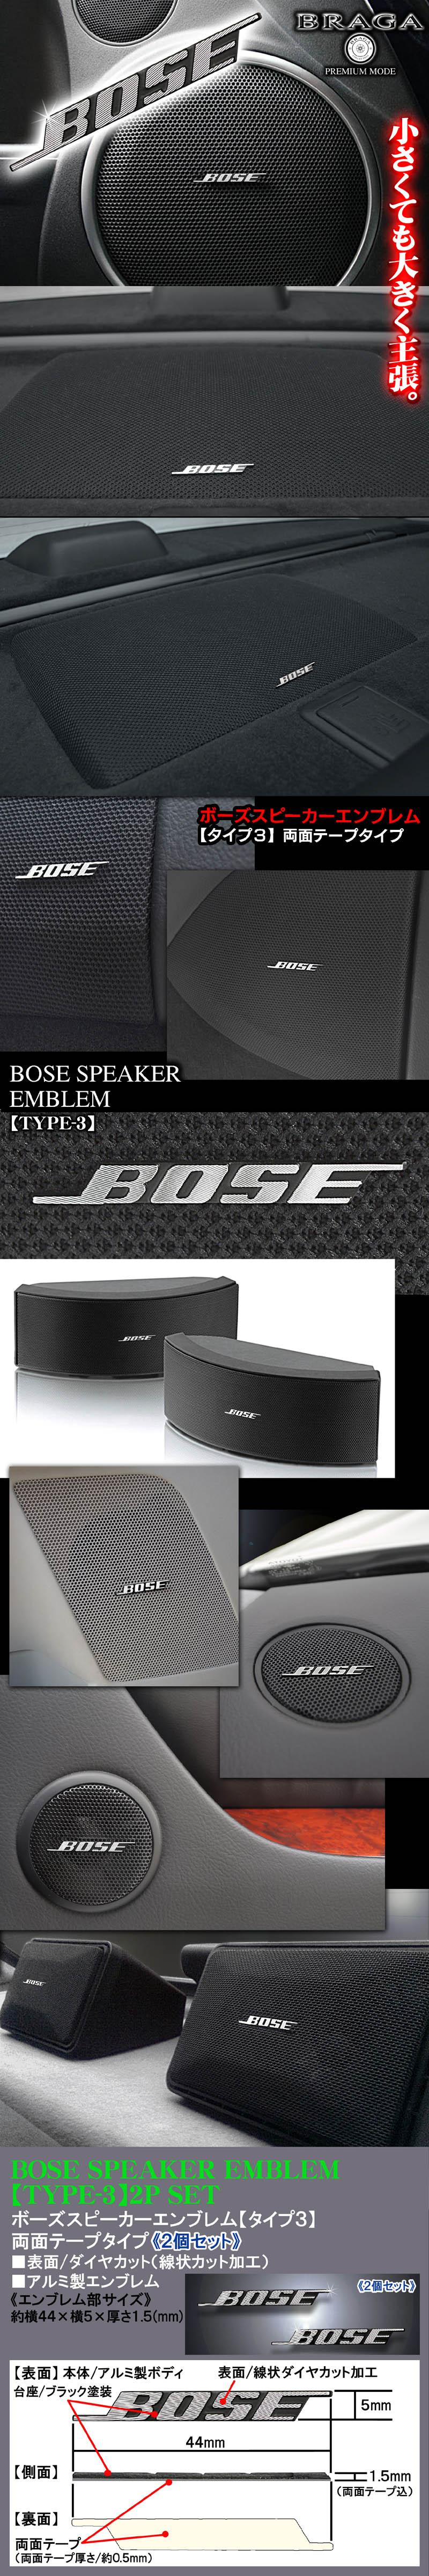 《BOSE》ボーズスピーカーエンブレム《タイプ3》2個セット【両面テープタイプ】アルミ製線状ダイヤカット仕上/ブラガ